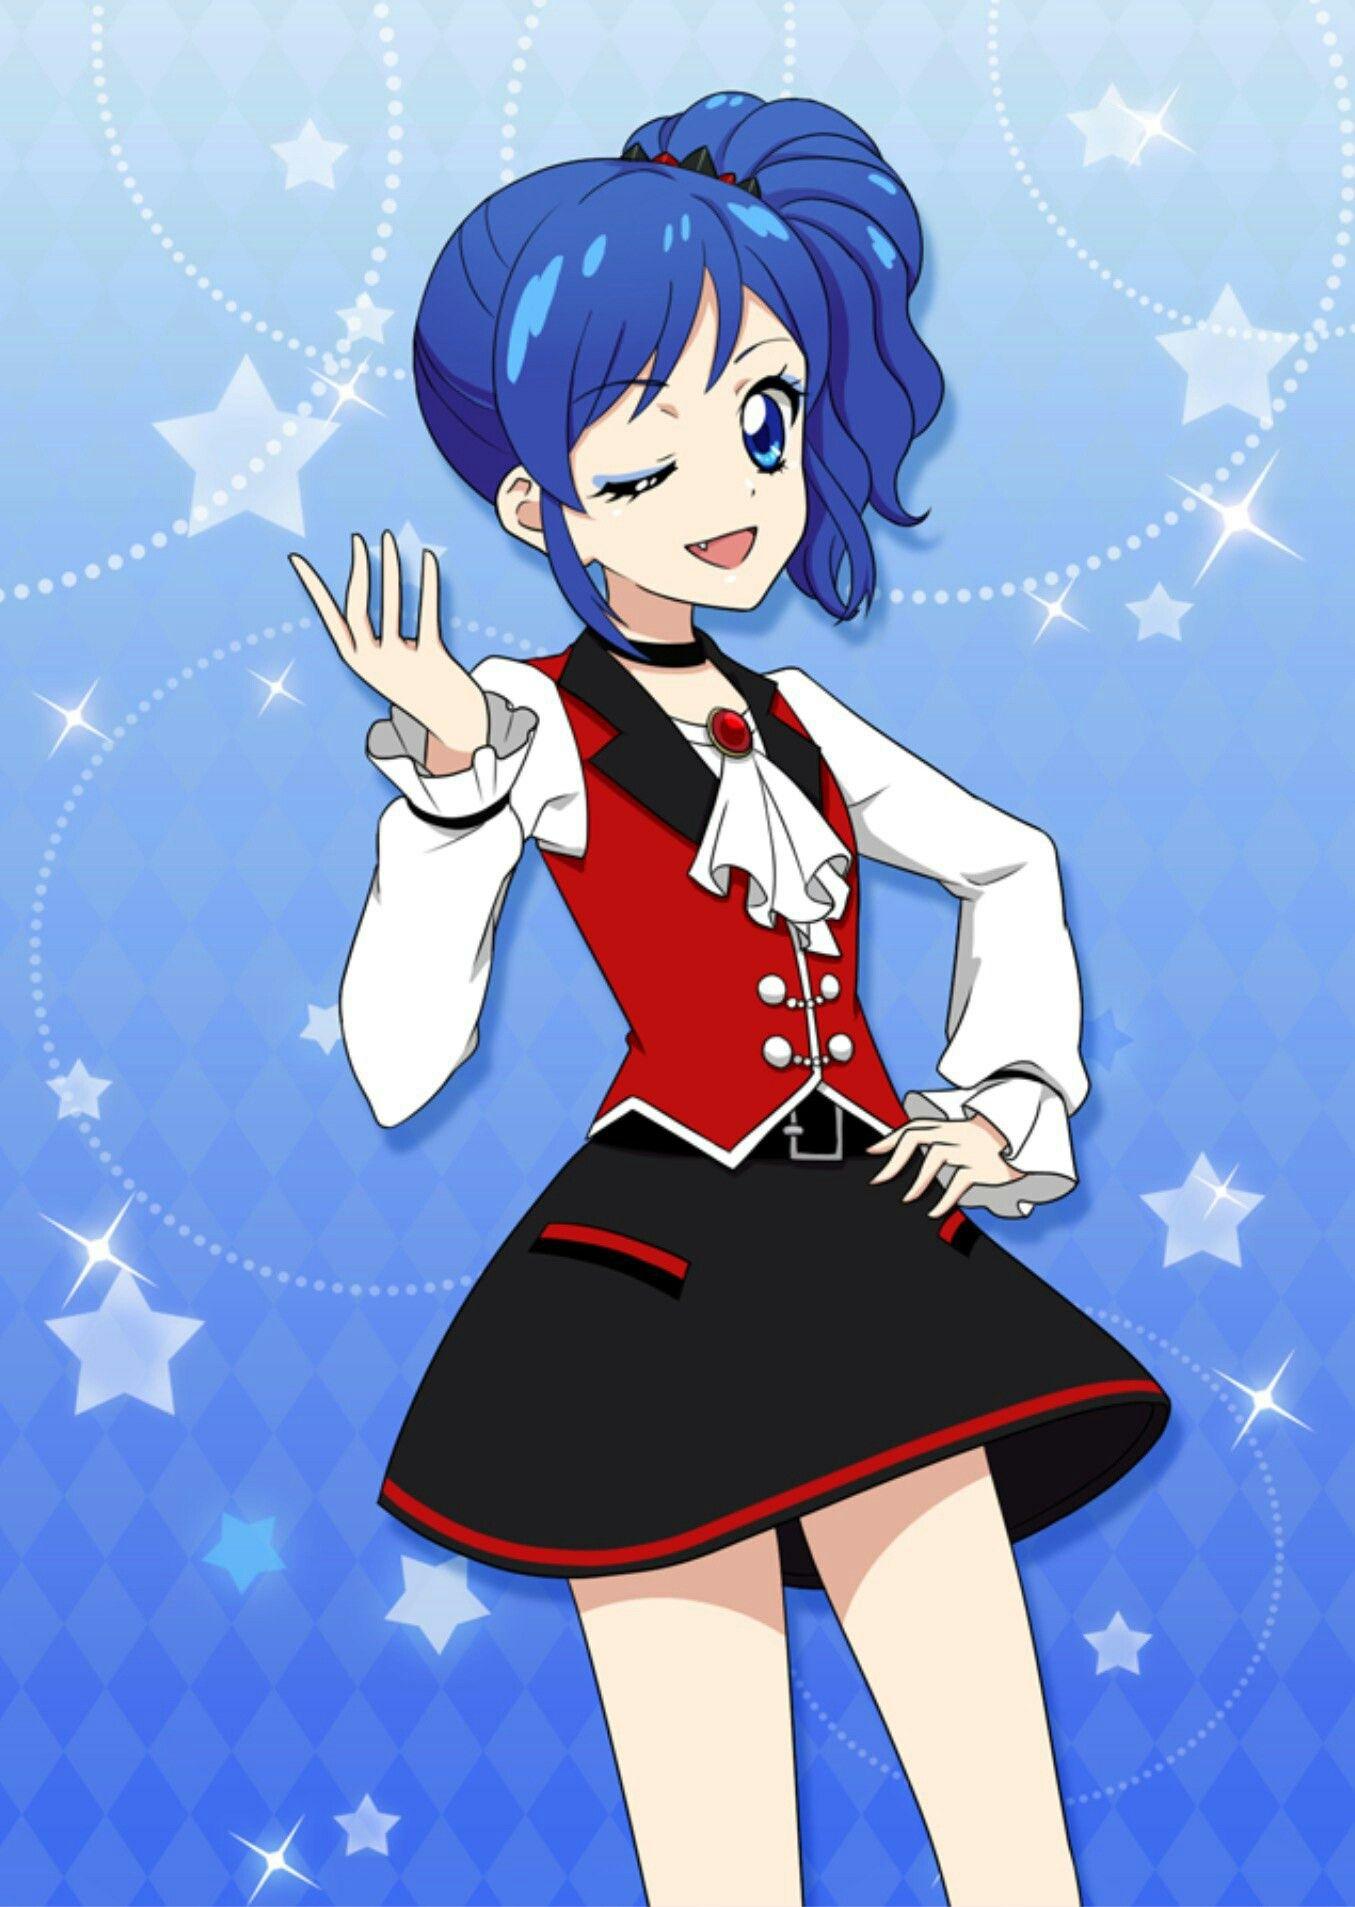 Aoi Look Like Vampire Anime Dress Sora Chibi Manga Miku